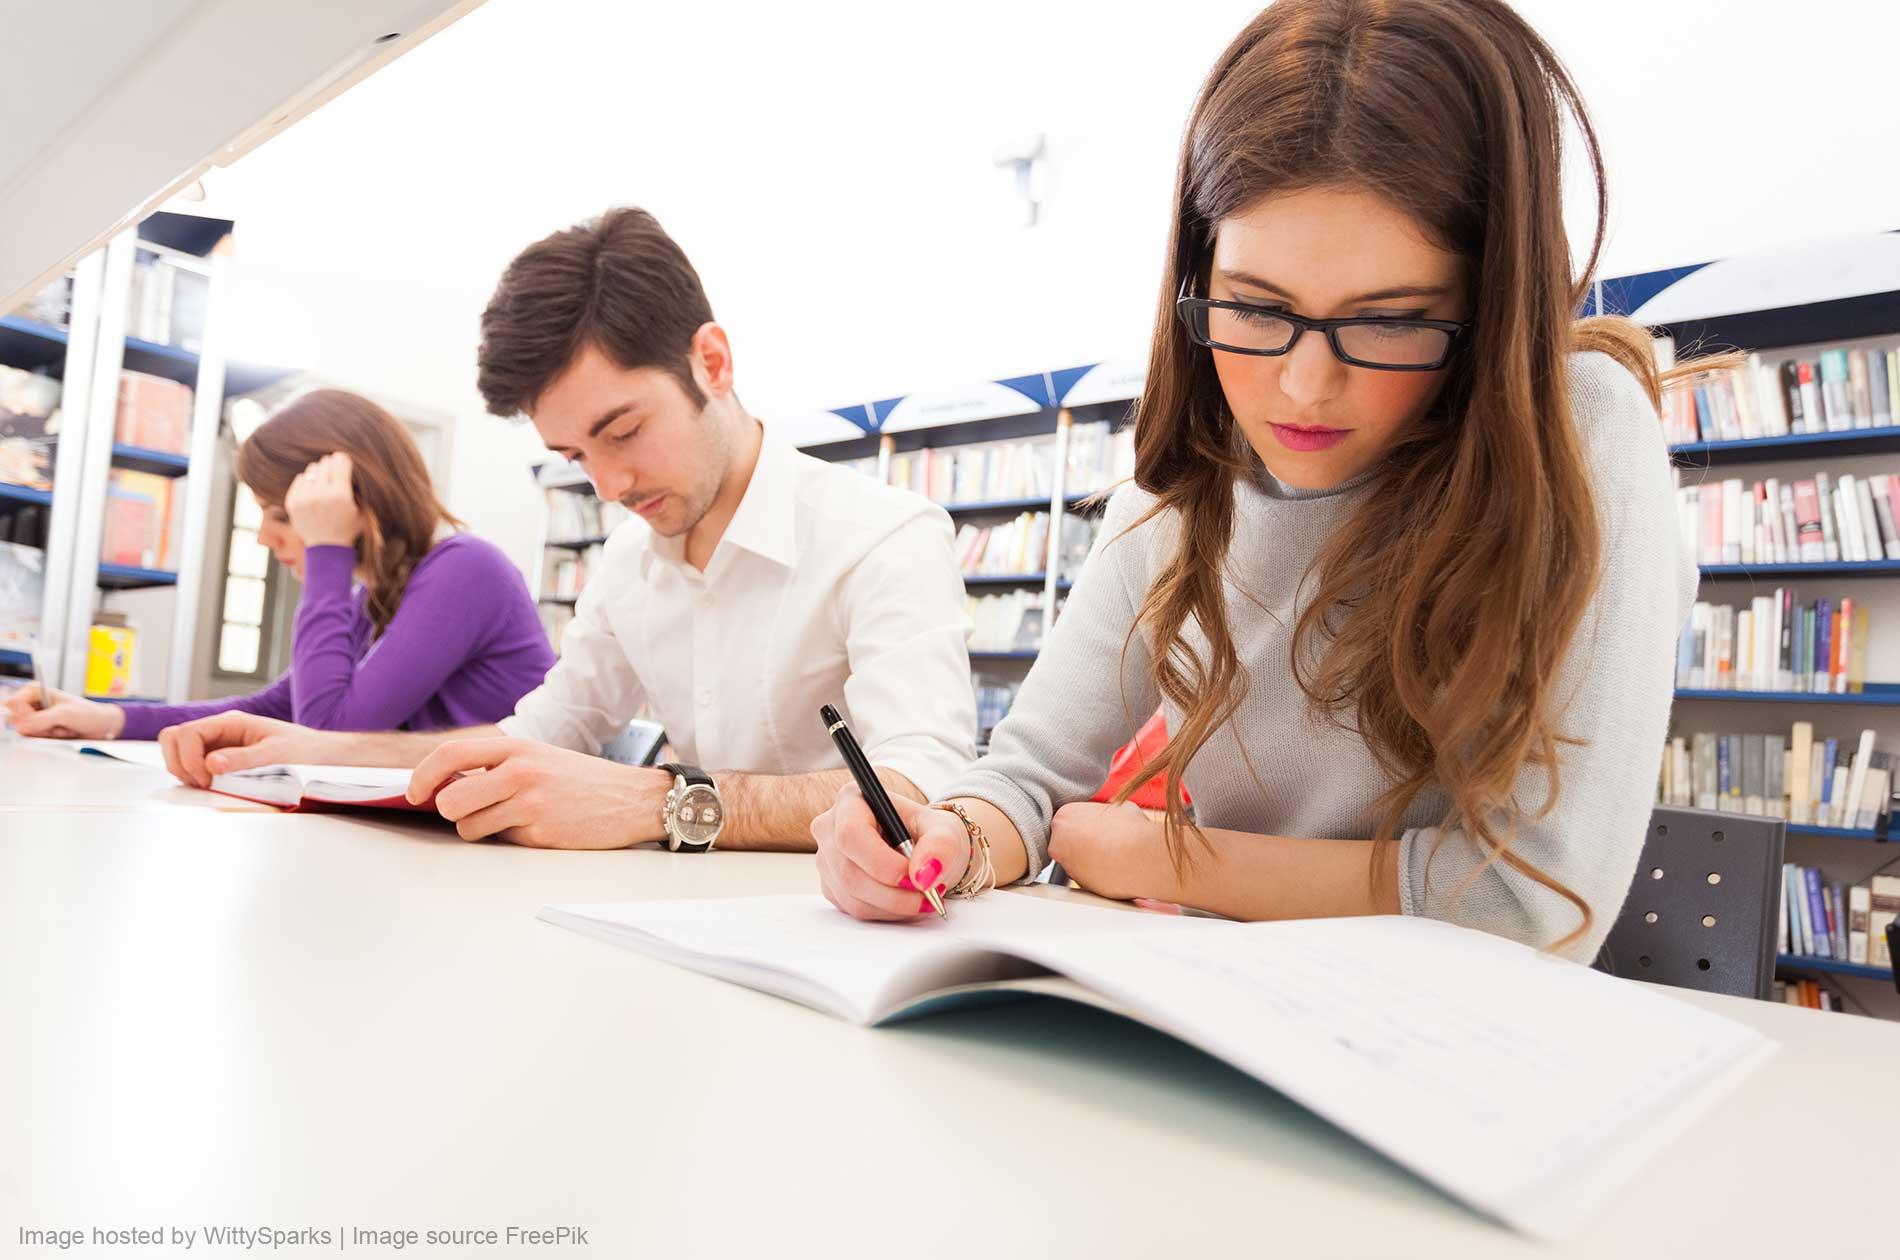 Self-awareness test for teens